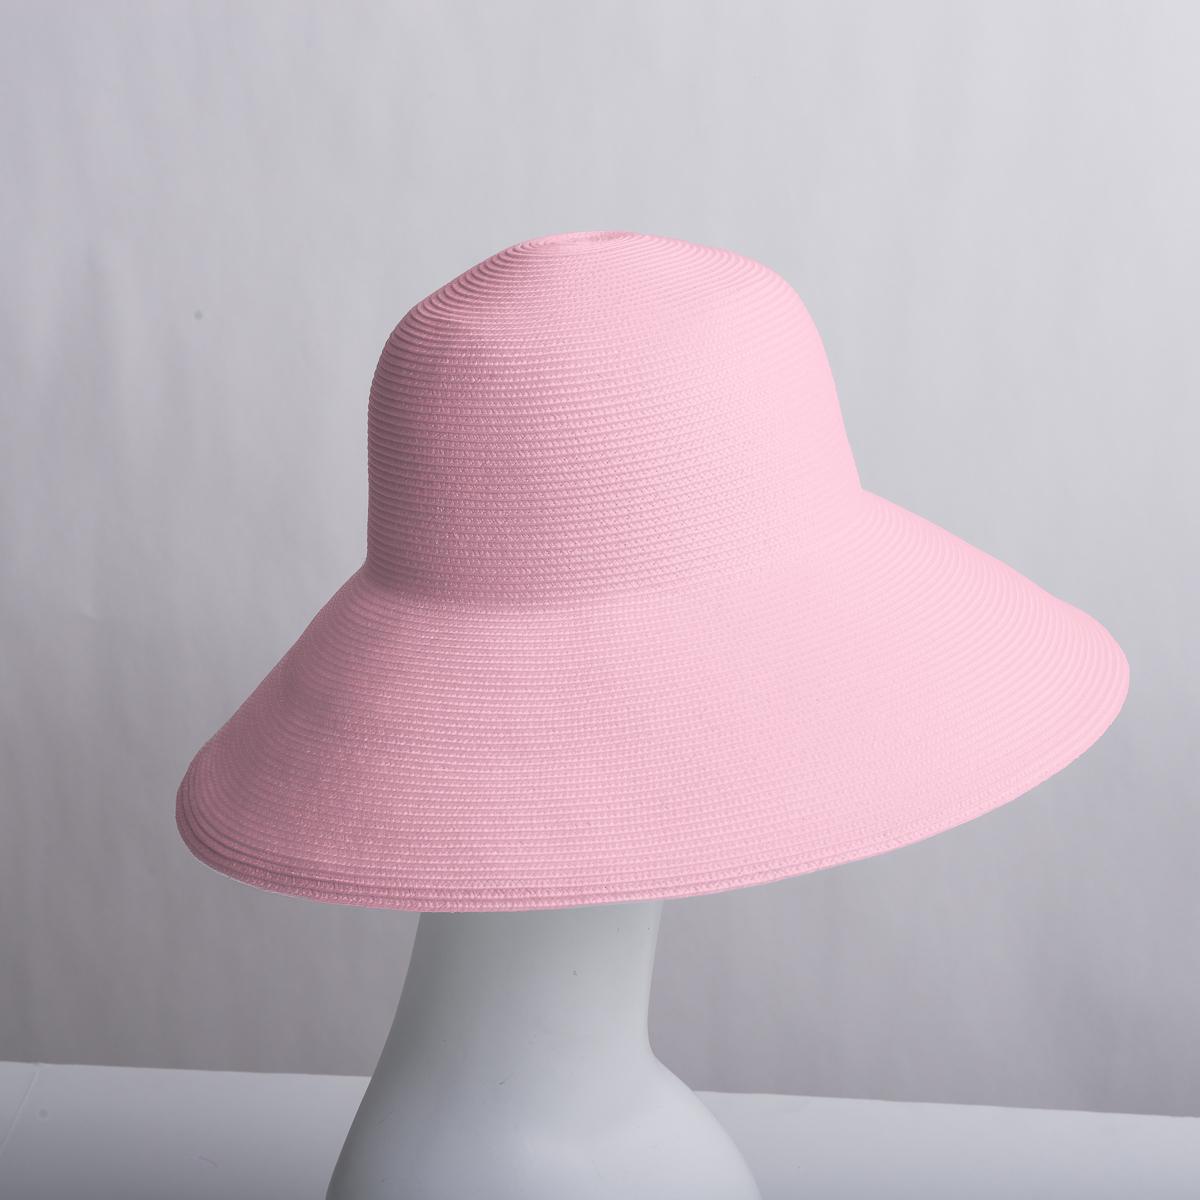 6117d6437d1 Light Pink Dull Medium Brim Blocked Untrimmed Poly Straw Hat Base - Sun  Yorkos